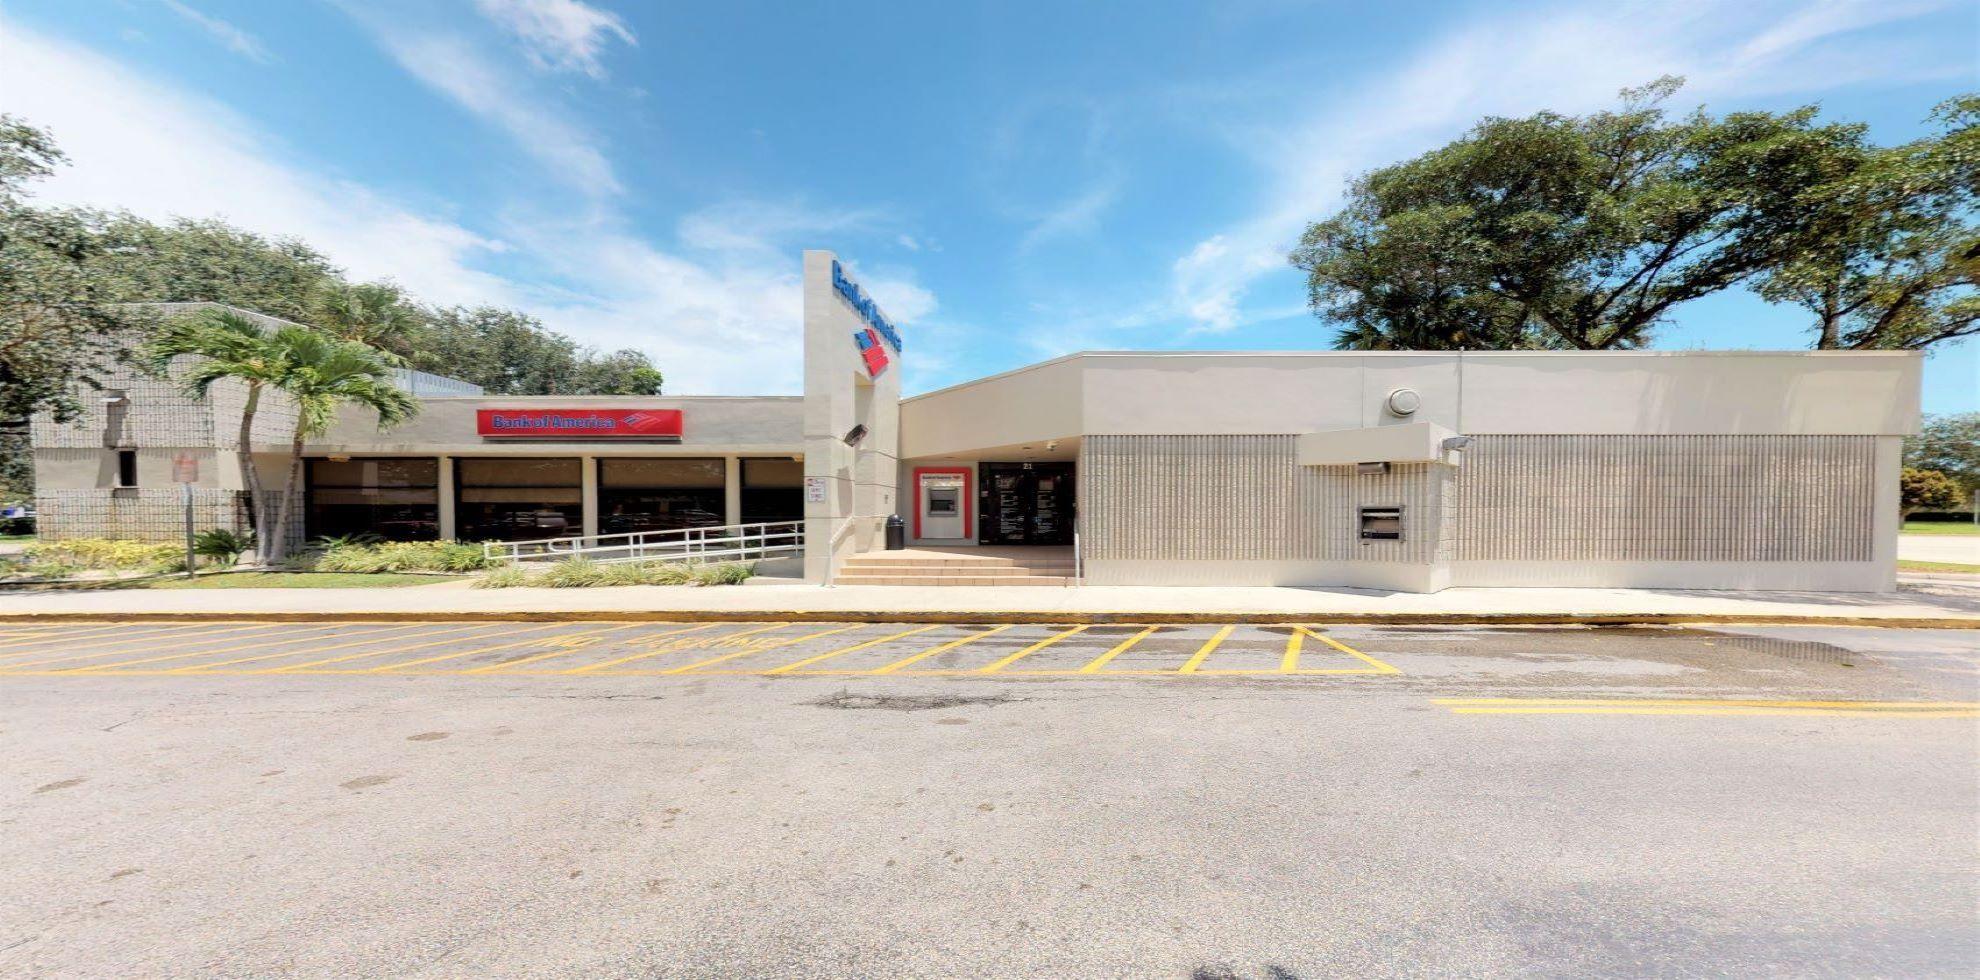 Bank of America financial center with drive-thru ATM   21 S Pompano Pkwy, Pompano Beach, FL 33069